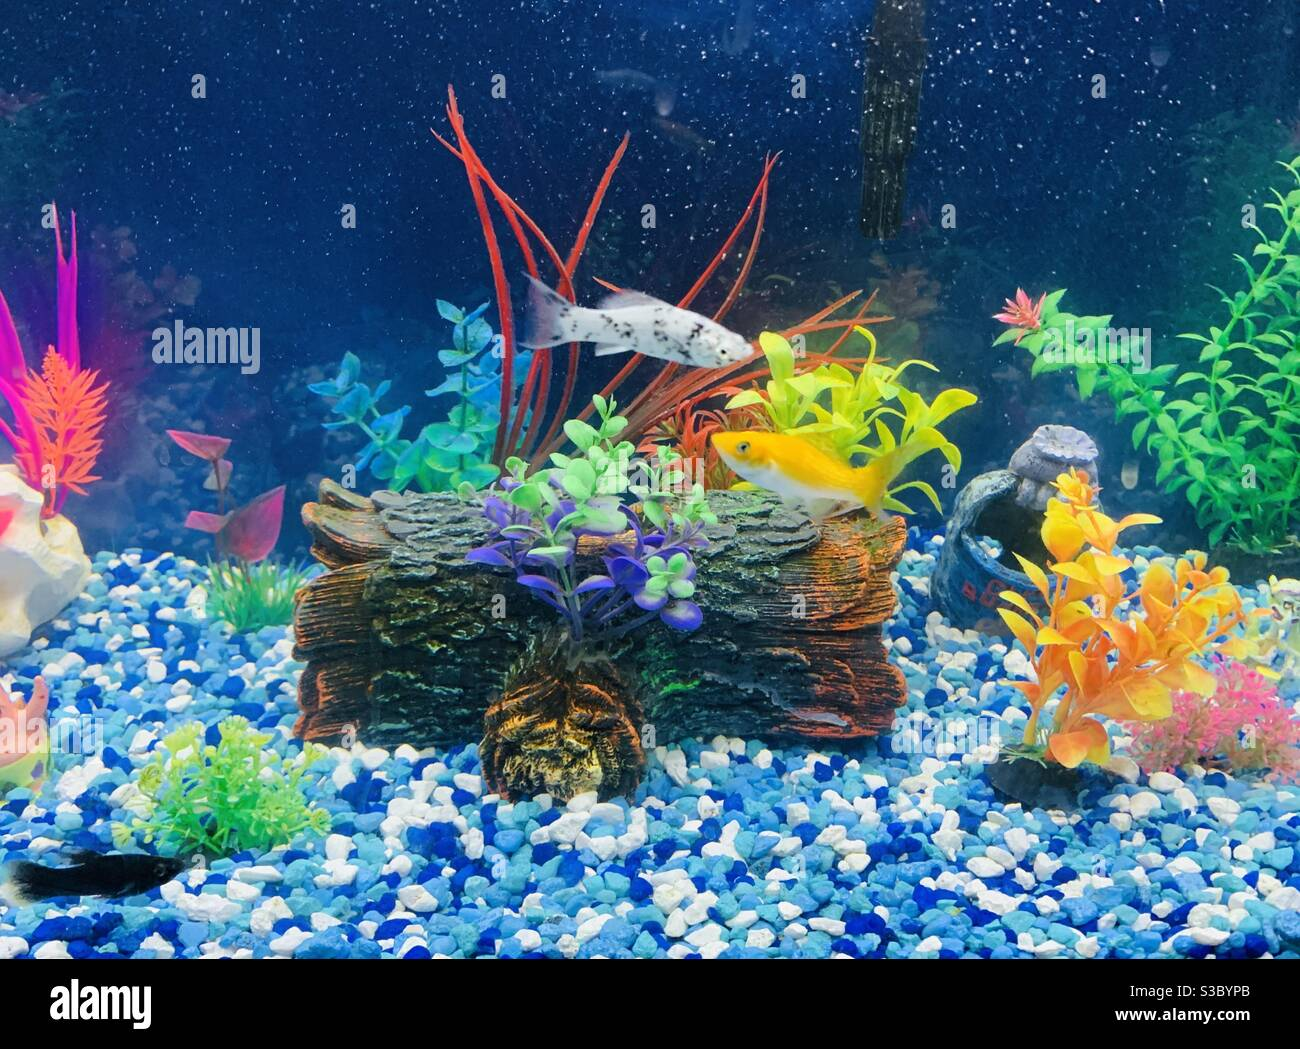 10 fish tank gallon setup best ❣️ 2021 for Rock